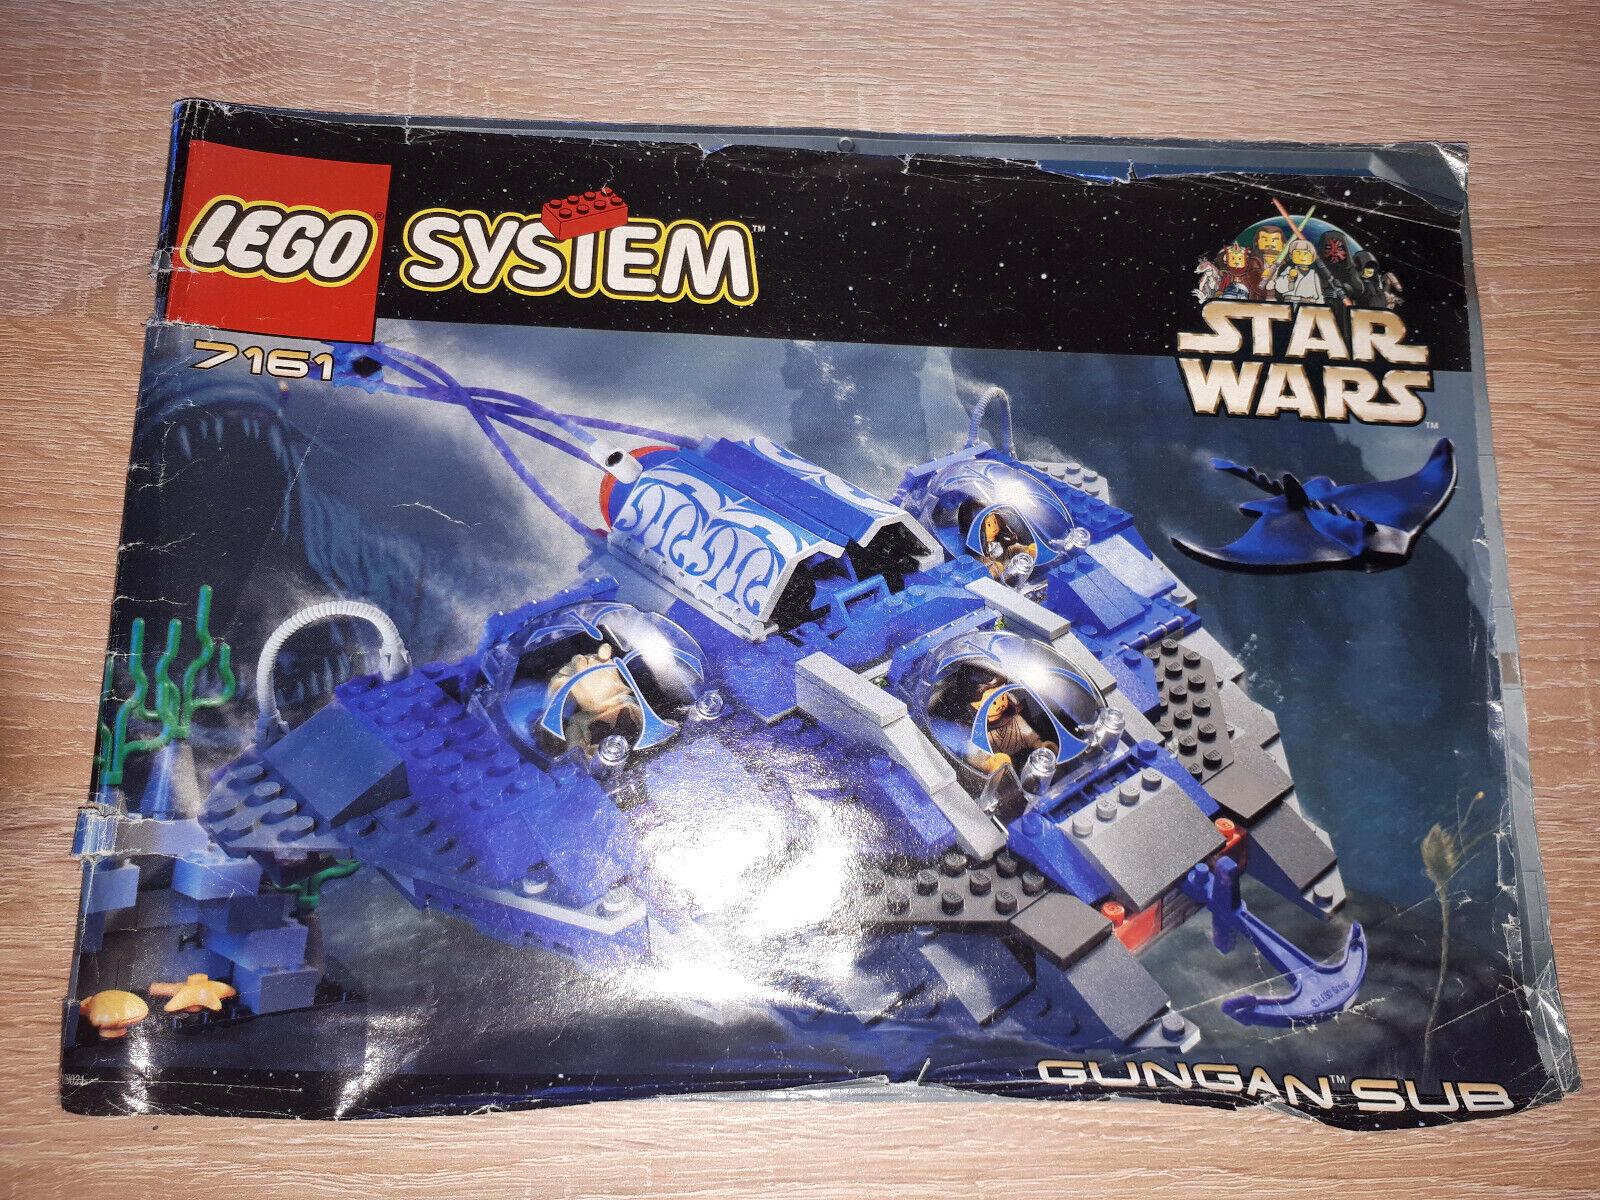 LEGO 7161 Star Wars Gungan Sub Episode 1